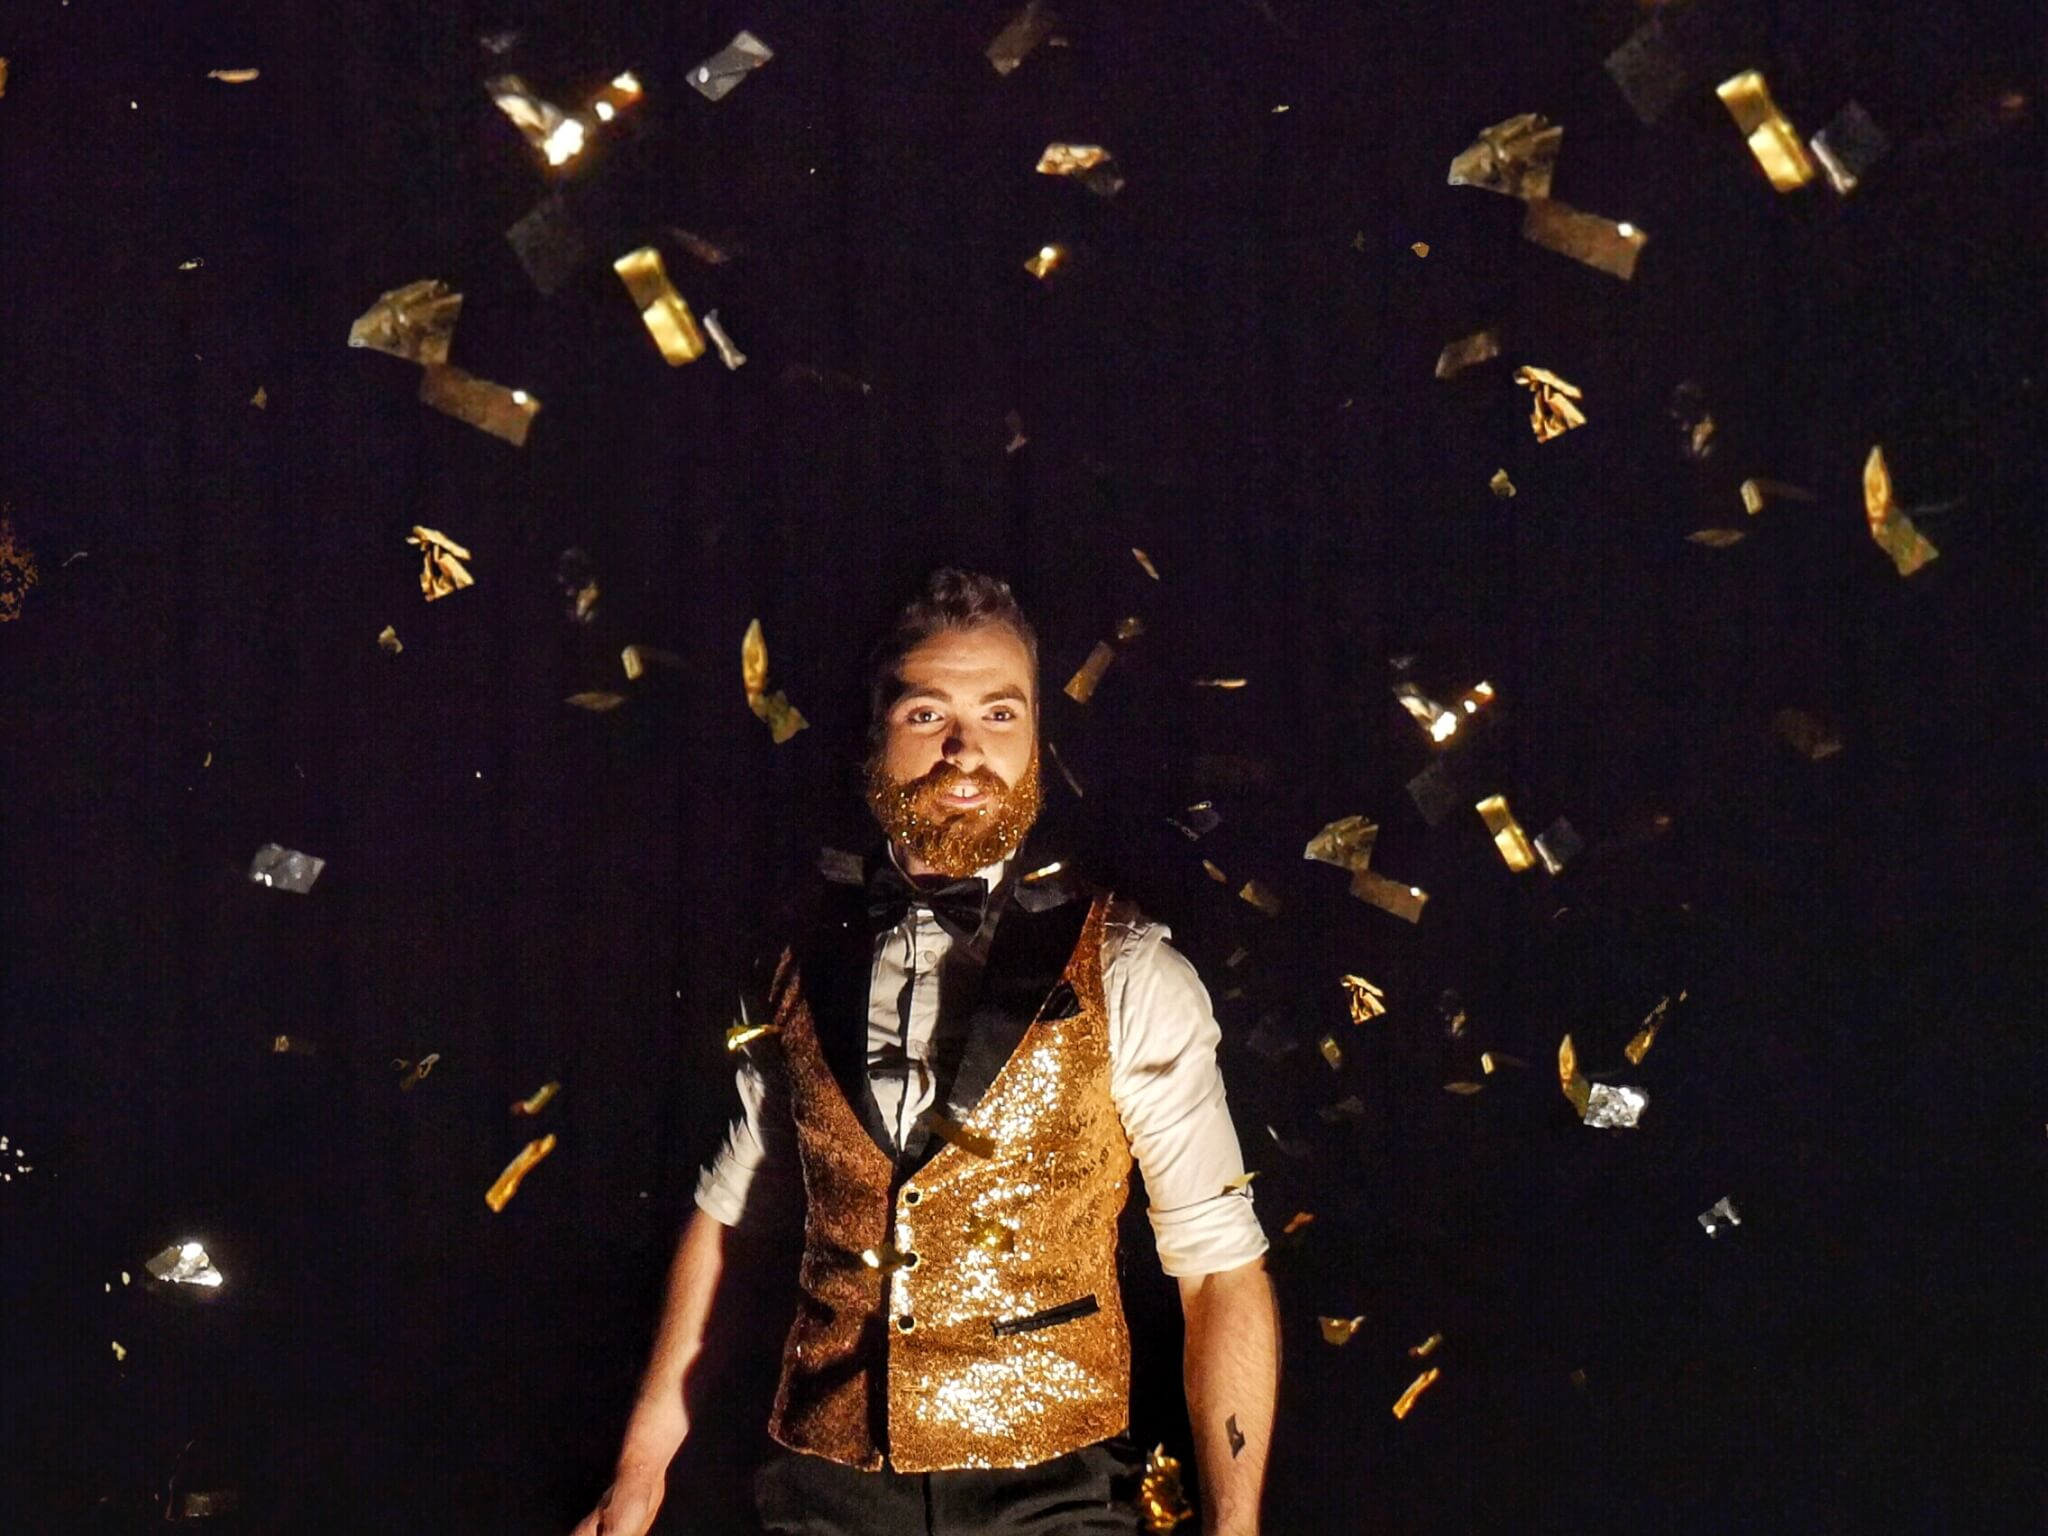 The Glitter Beard Juggler